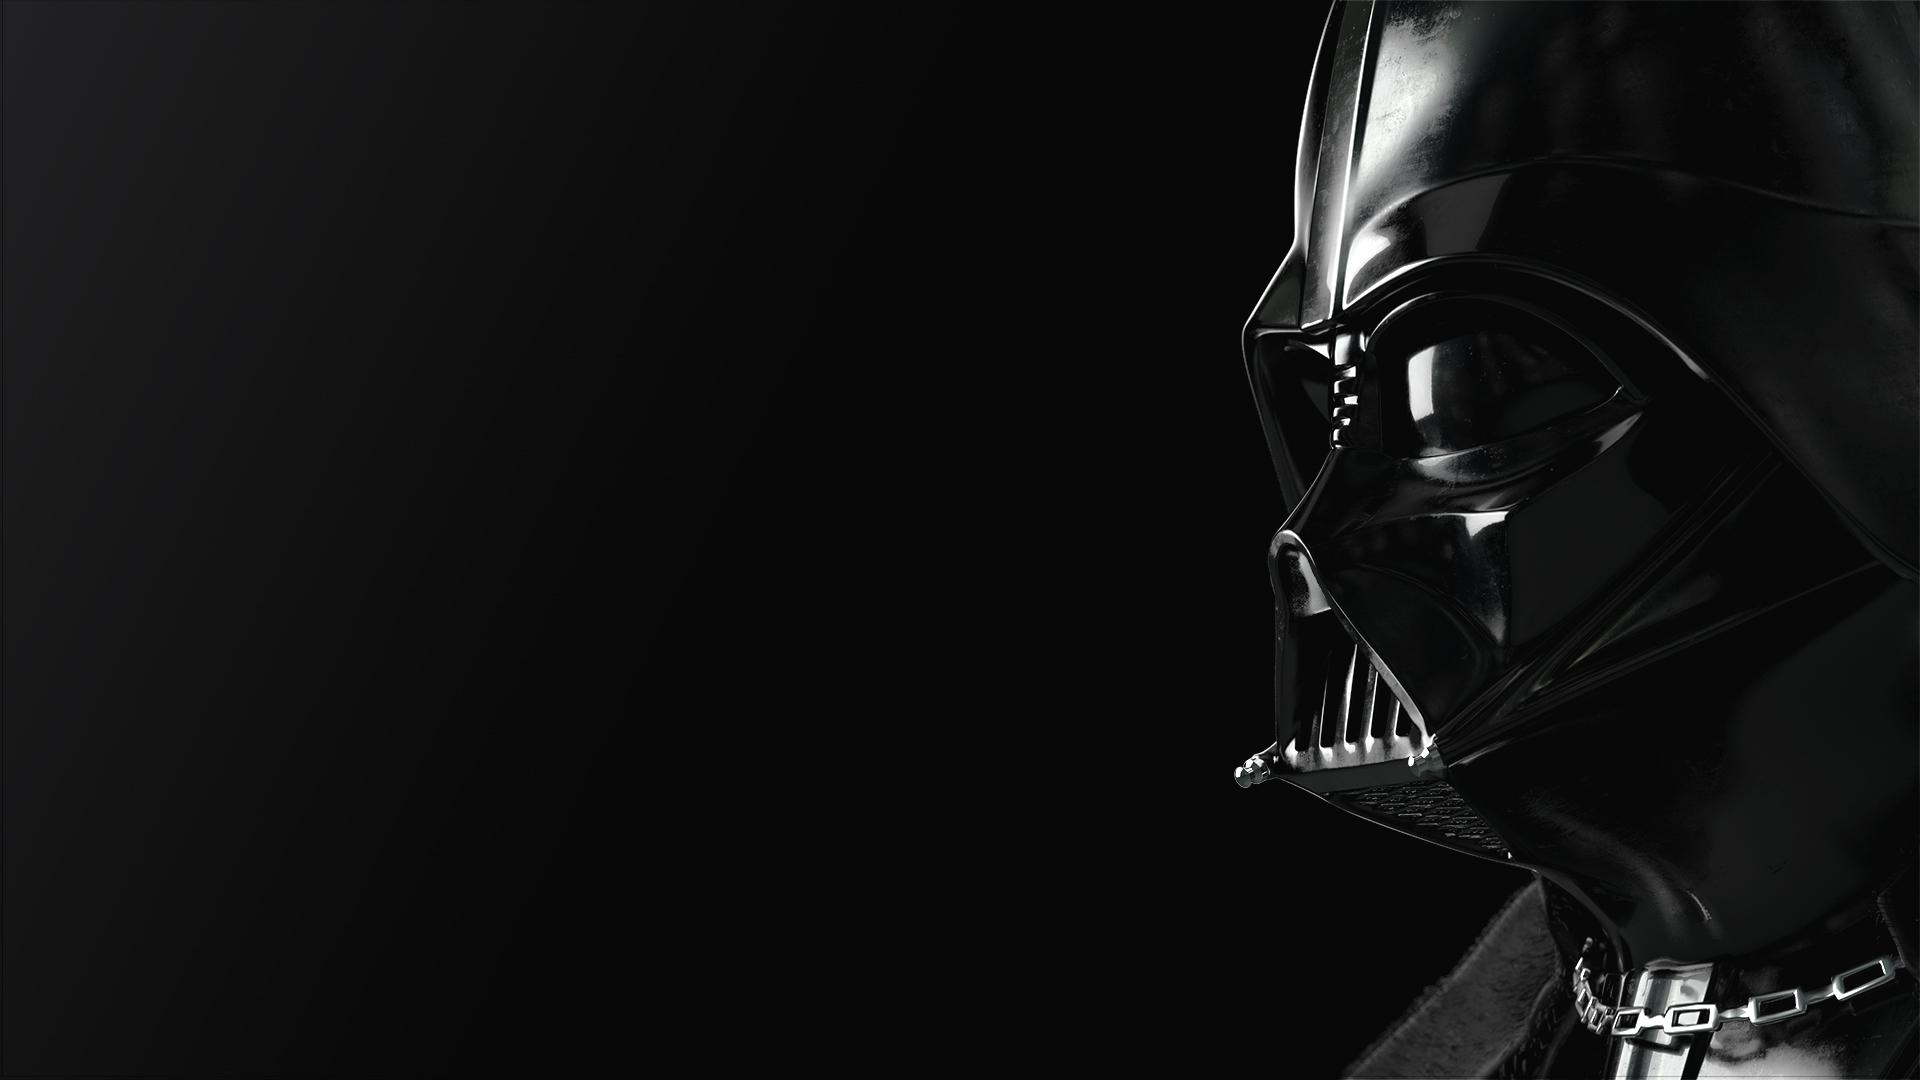 Free download Star Wars Battlefront 688486 Full HD ...